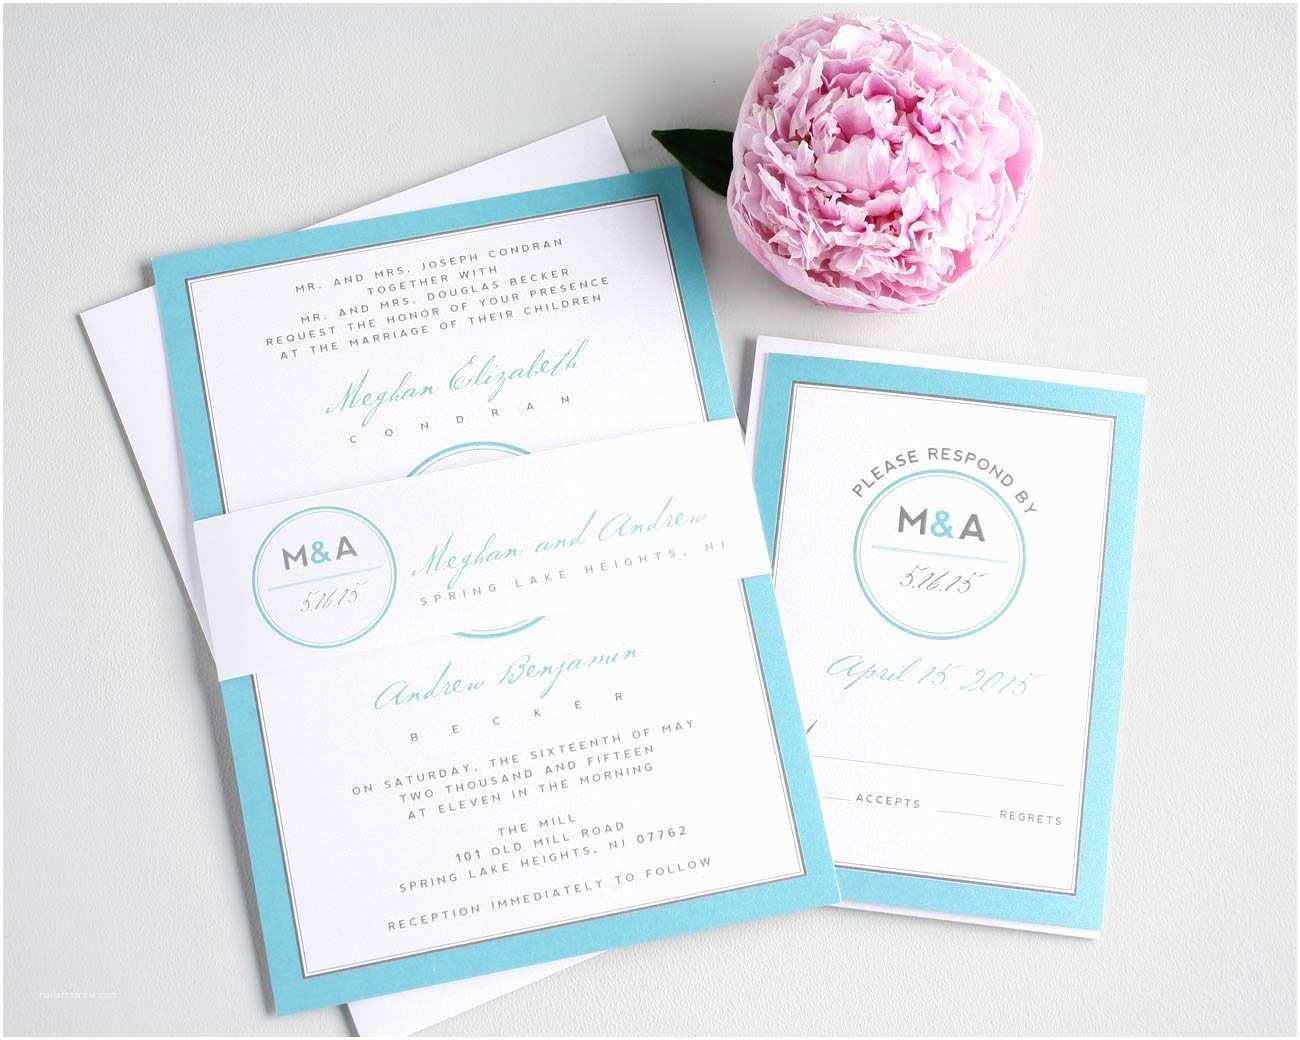 Monogram Wedding Invitations Modern Blue Wedding Invites with A Circle Monogram